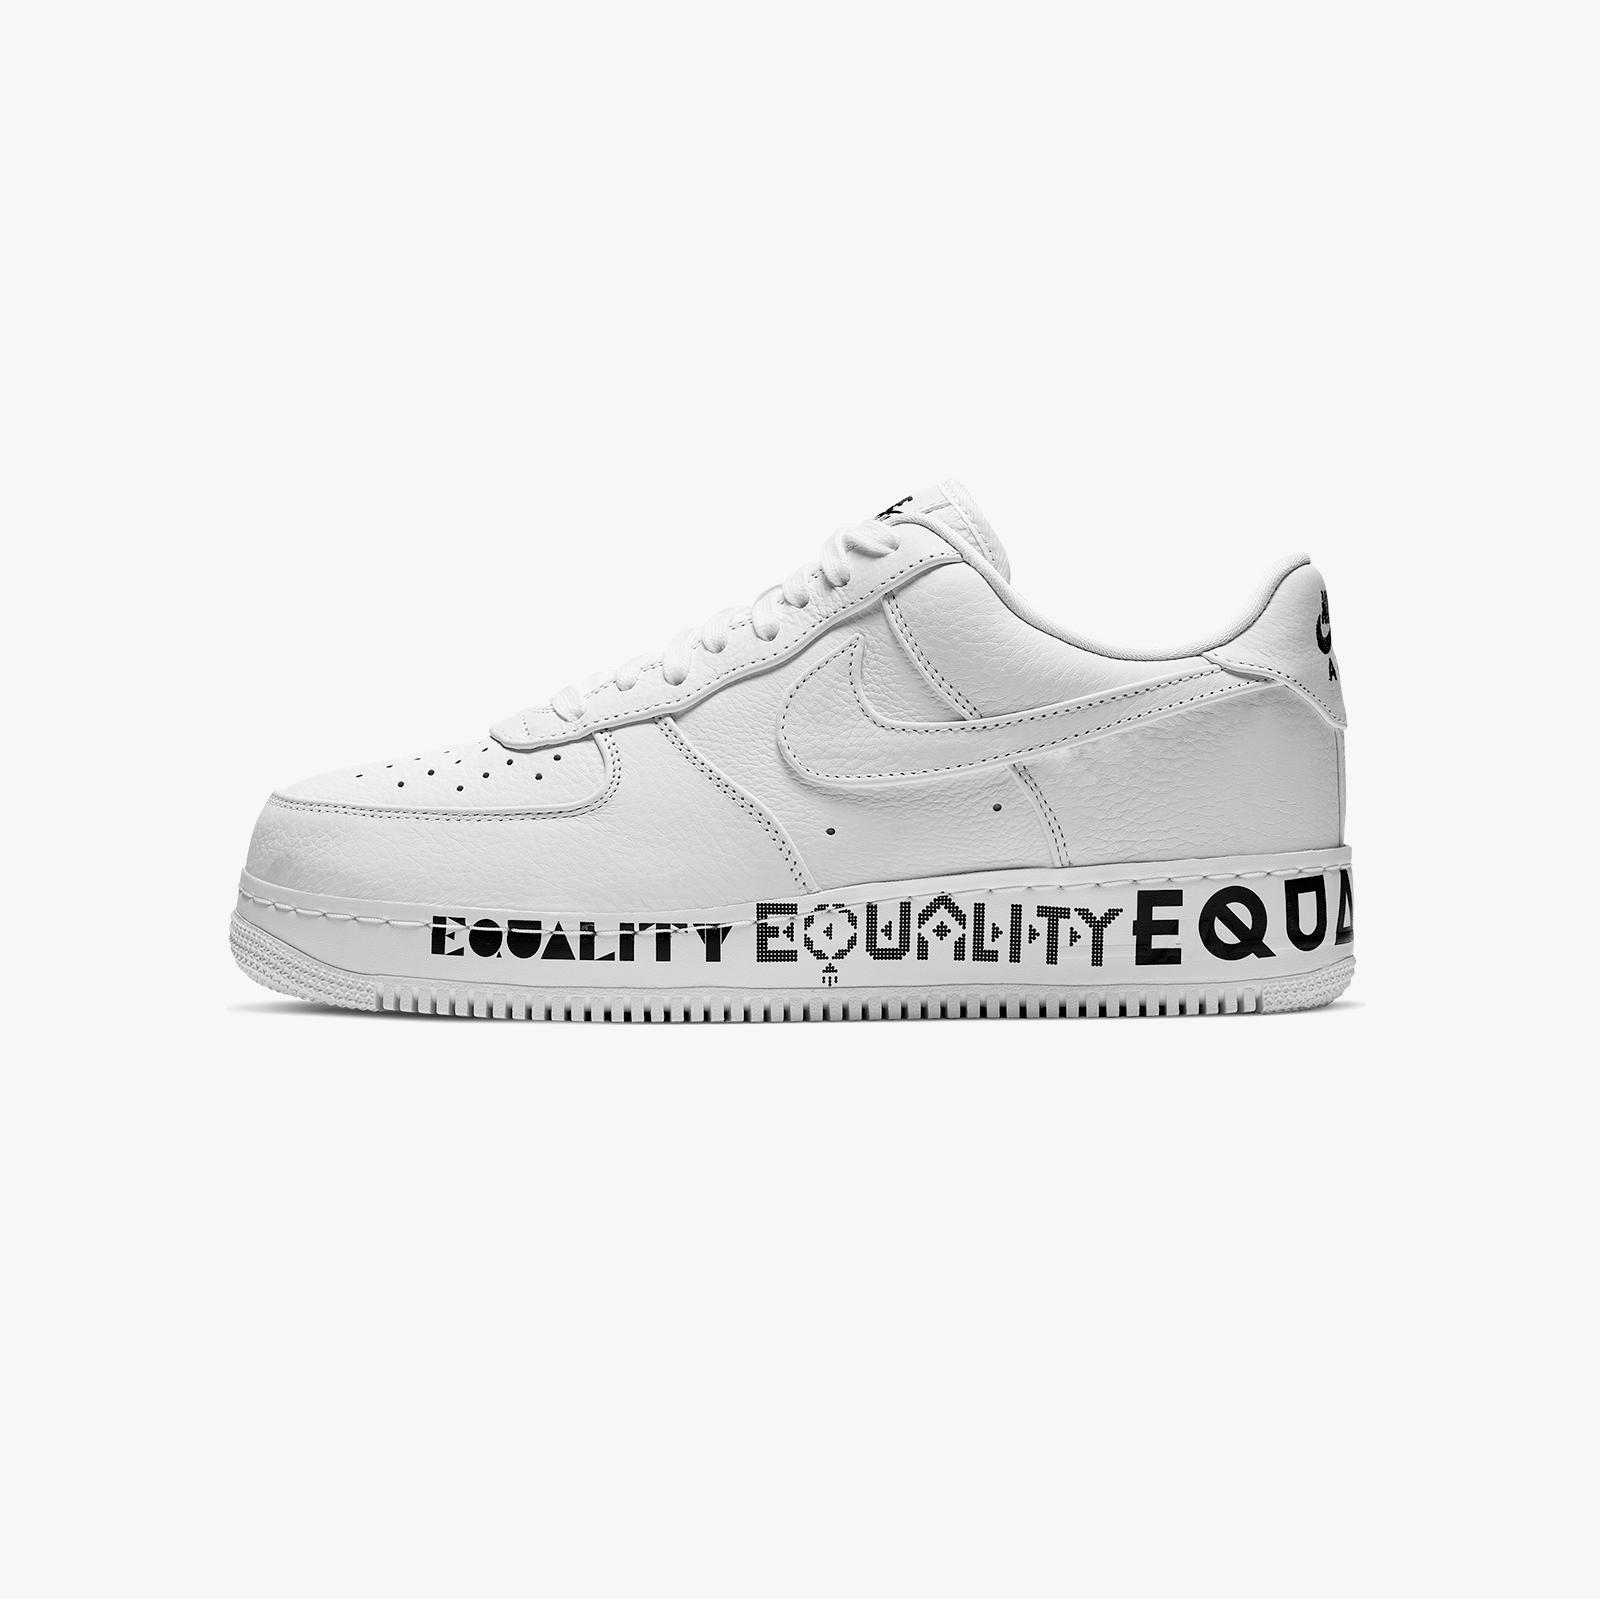 Nike Air Force 1 CMFT Low Equality Aq2118 100